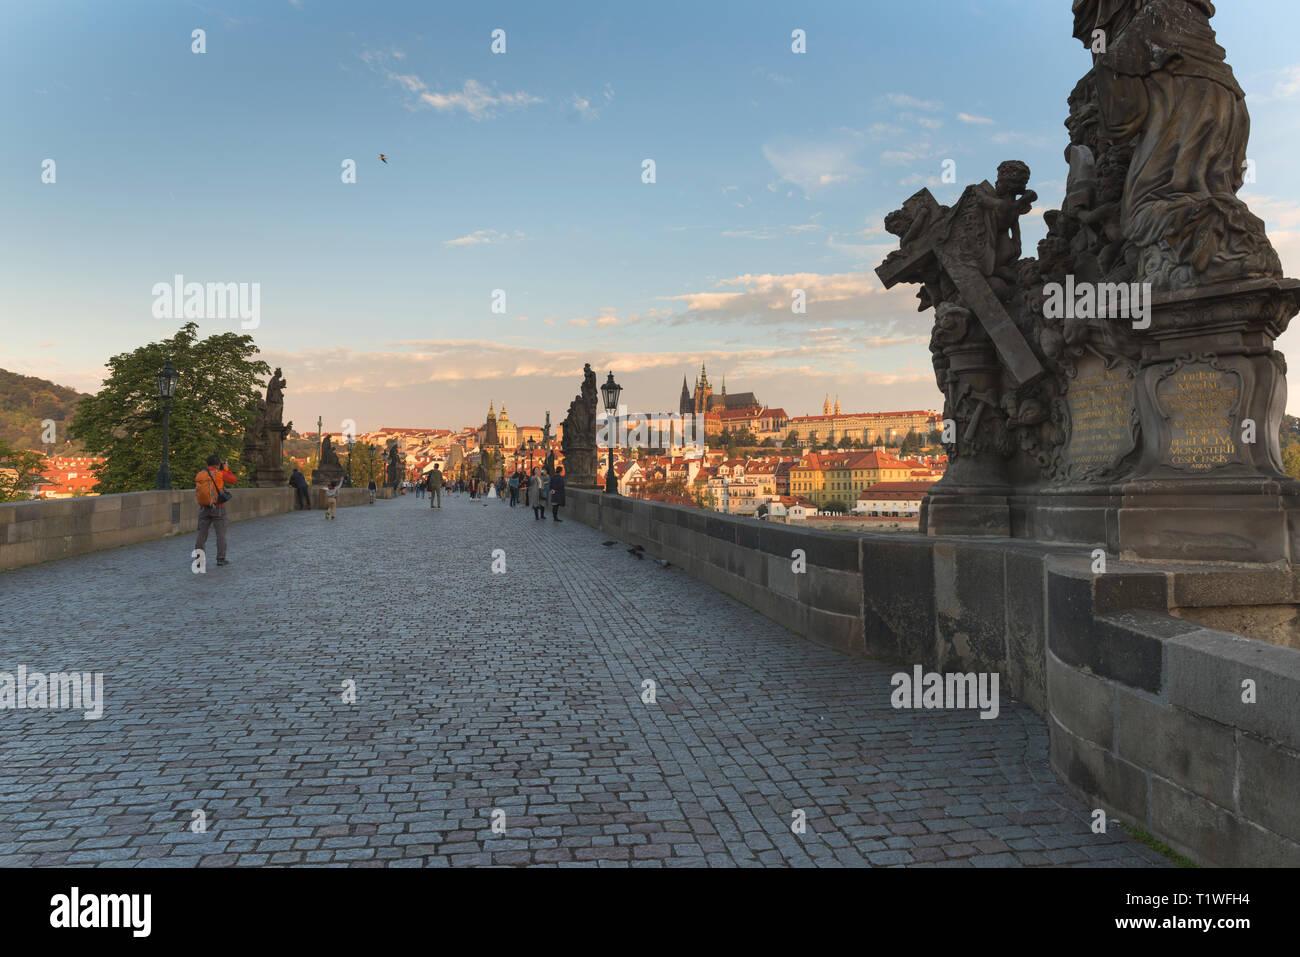 Stätten der Datierung der tschechischen Republik